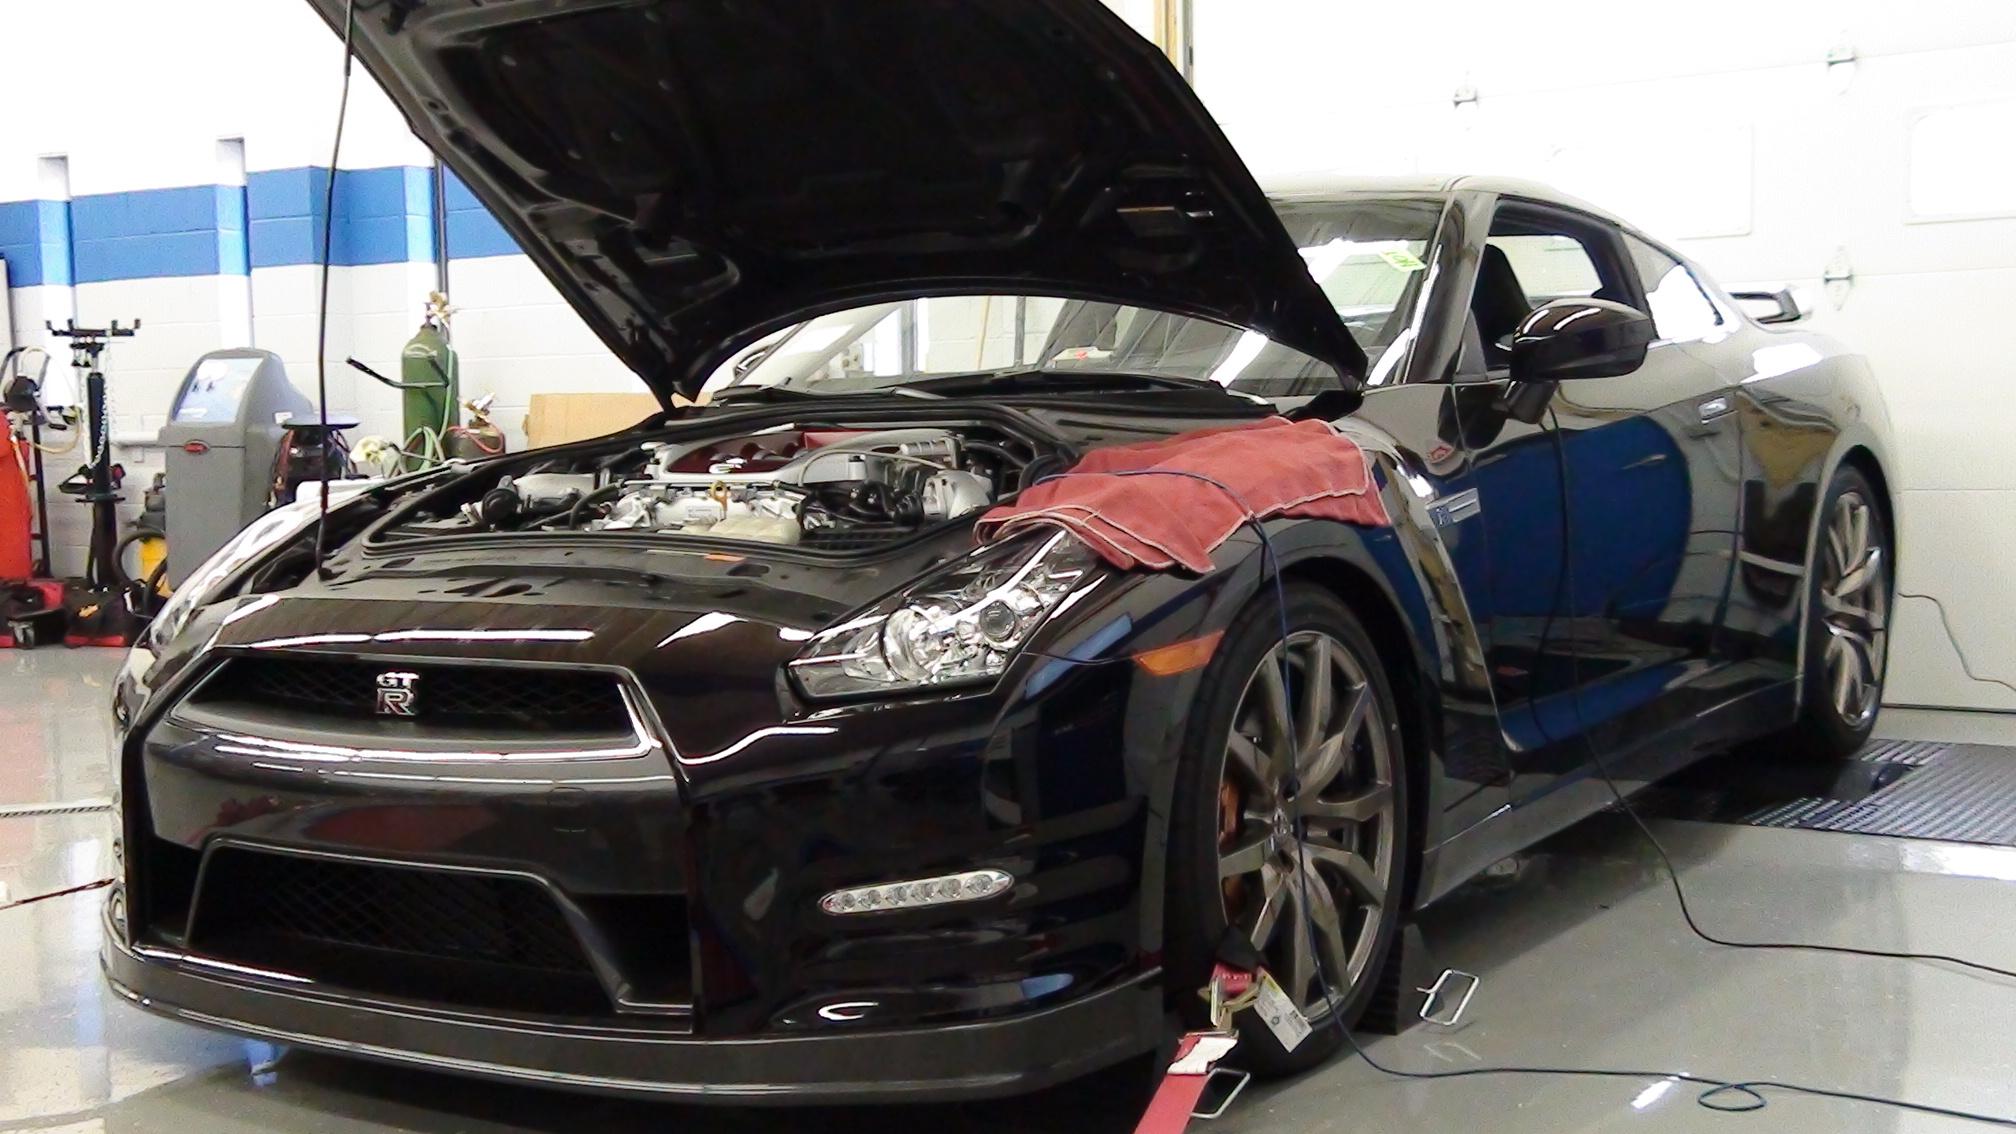 Nissan GTR Midnight Opal Alpha 10+ Build From P1 Motorcars | P1 ...